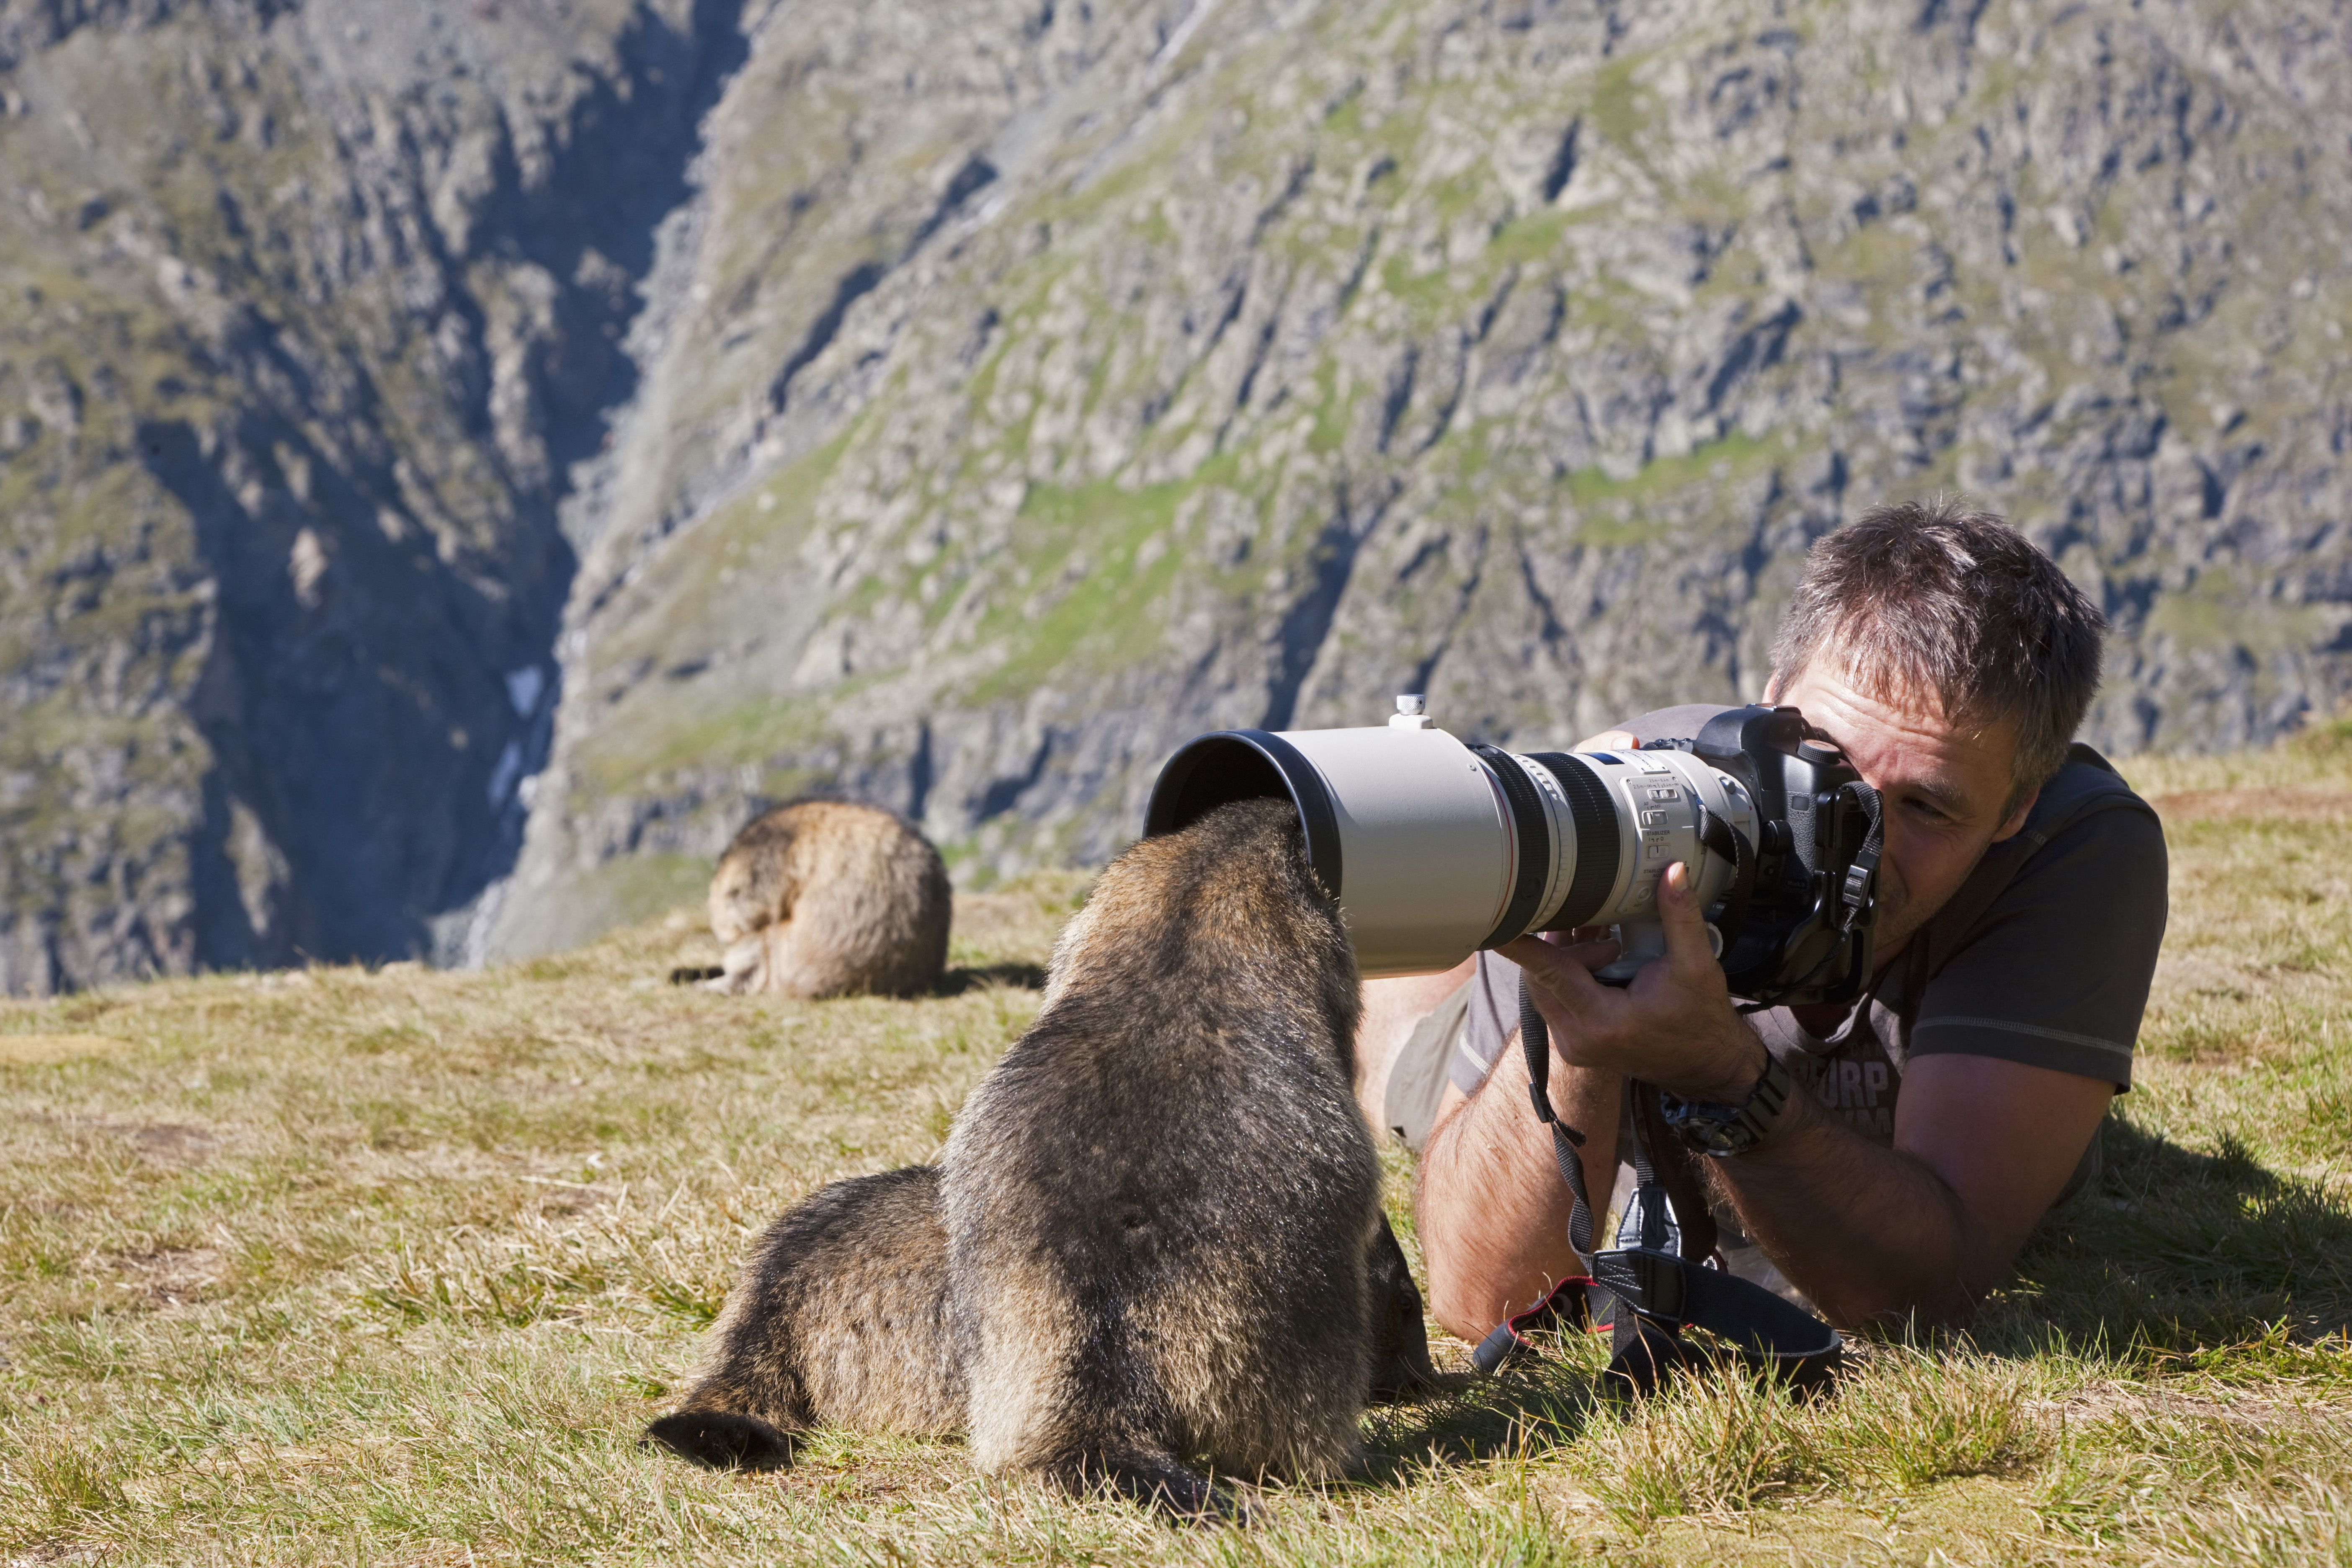 animal photographer career profile - Wildlife Biologist Job Description